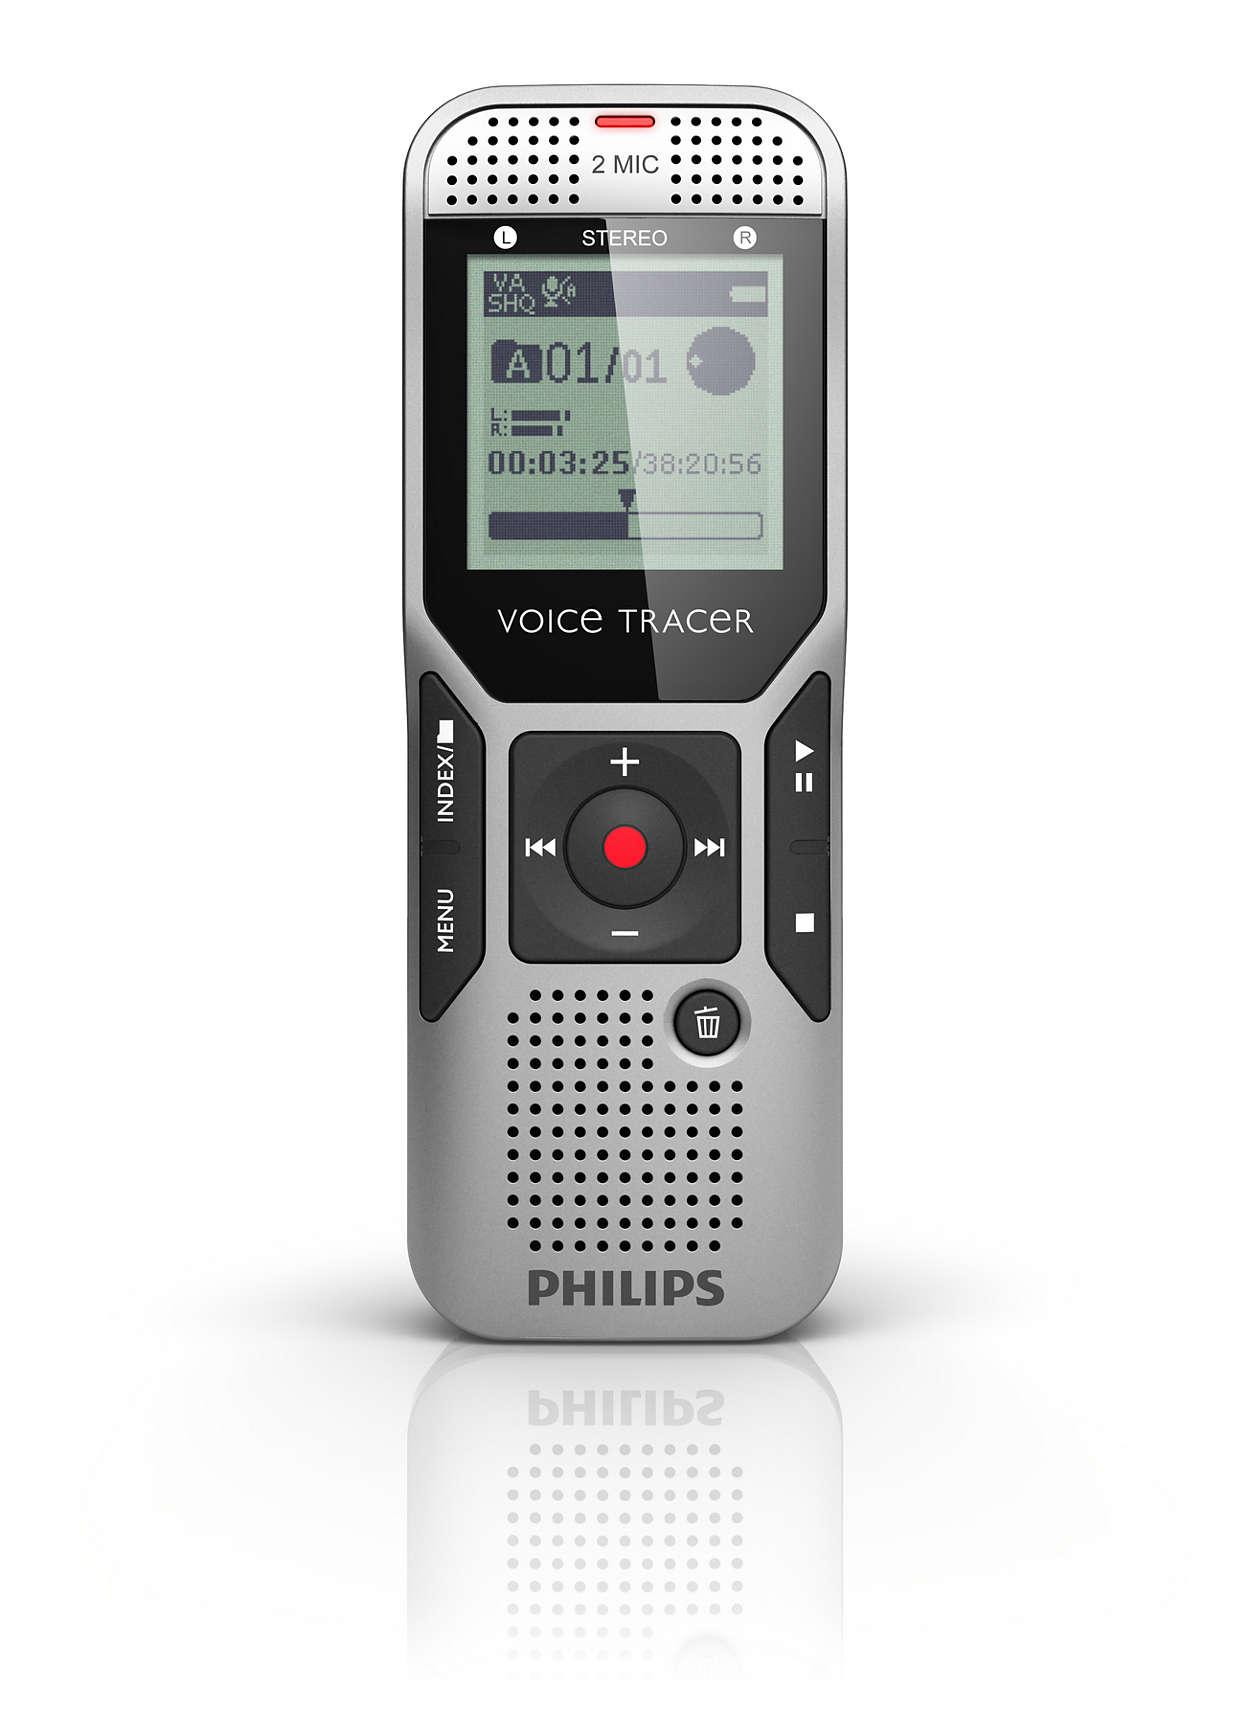 philips voice tracer dvt2700 user manual